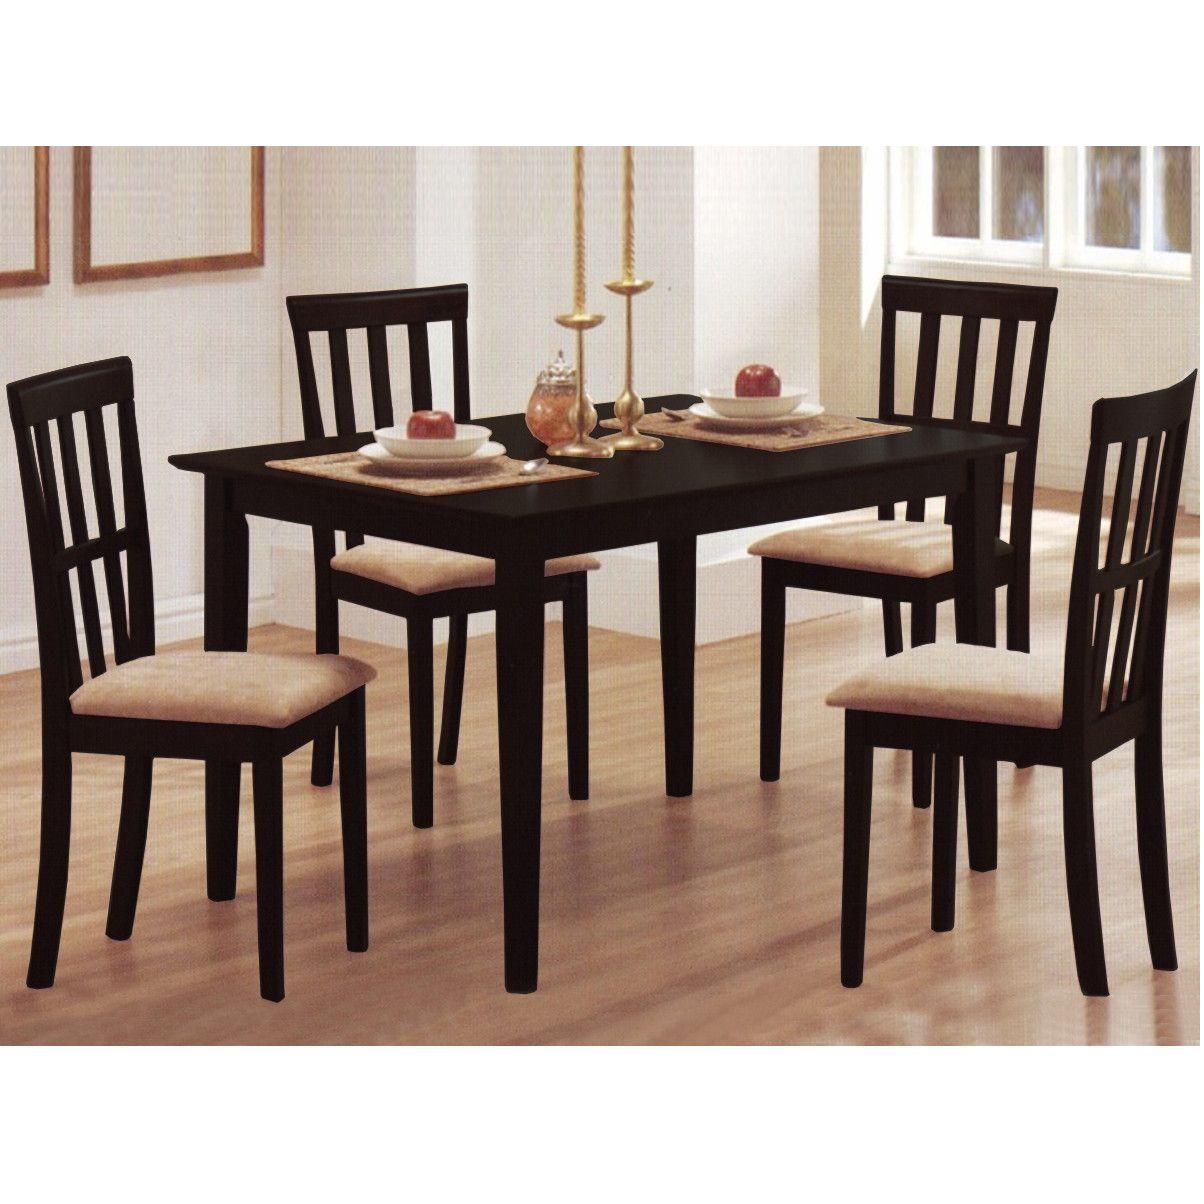 Baxton Studio Jet Moon 5 Piece Dining Set Counter Height Dining Table Dining Room Sets Dining Table Setting